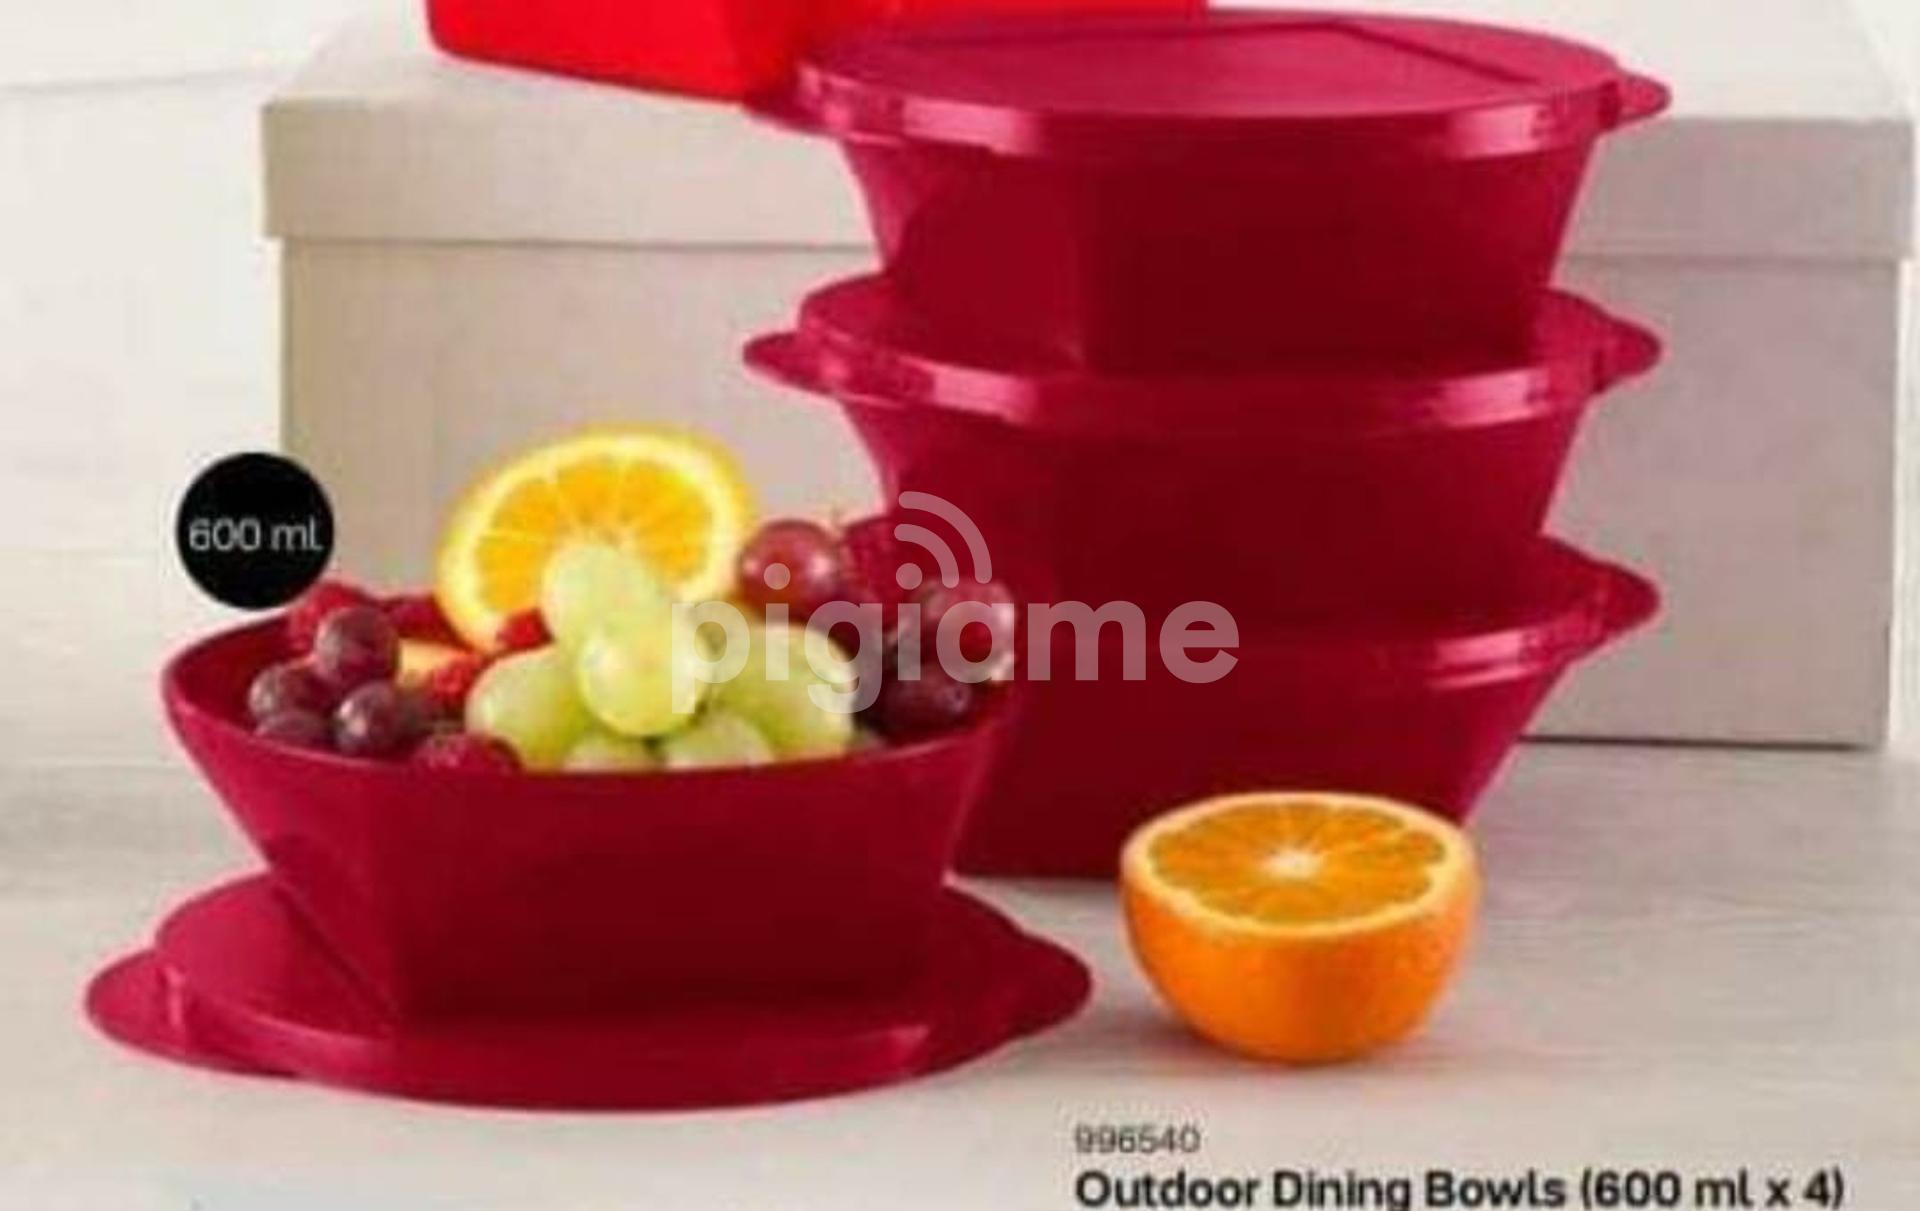 Tupperware Outdoor Dining Bowls 600 Ml X 4 In Nairobi Pigiame